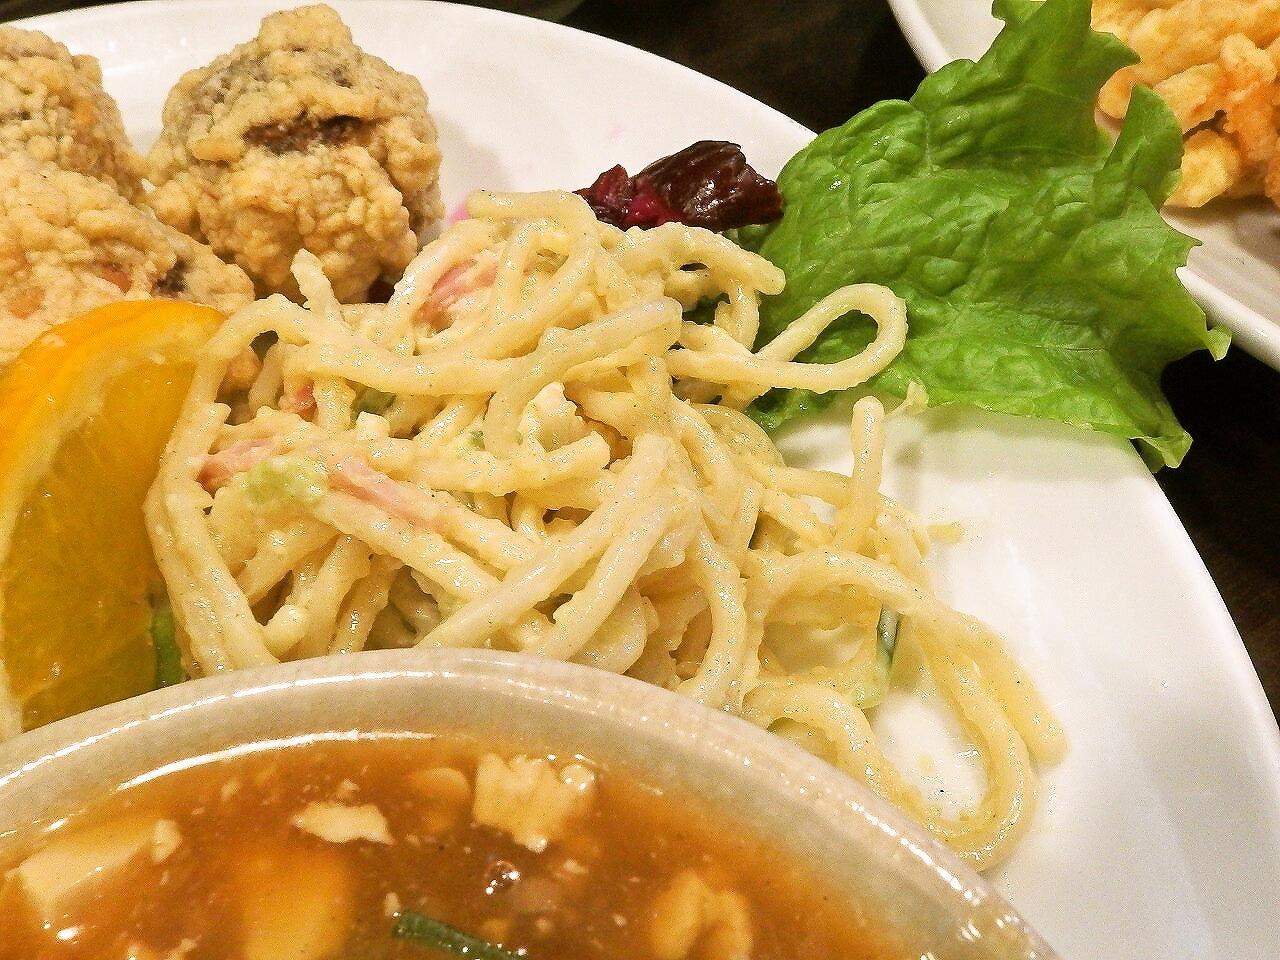 s-foodpic7609357.jpg